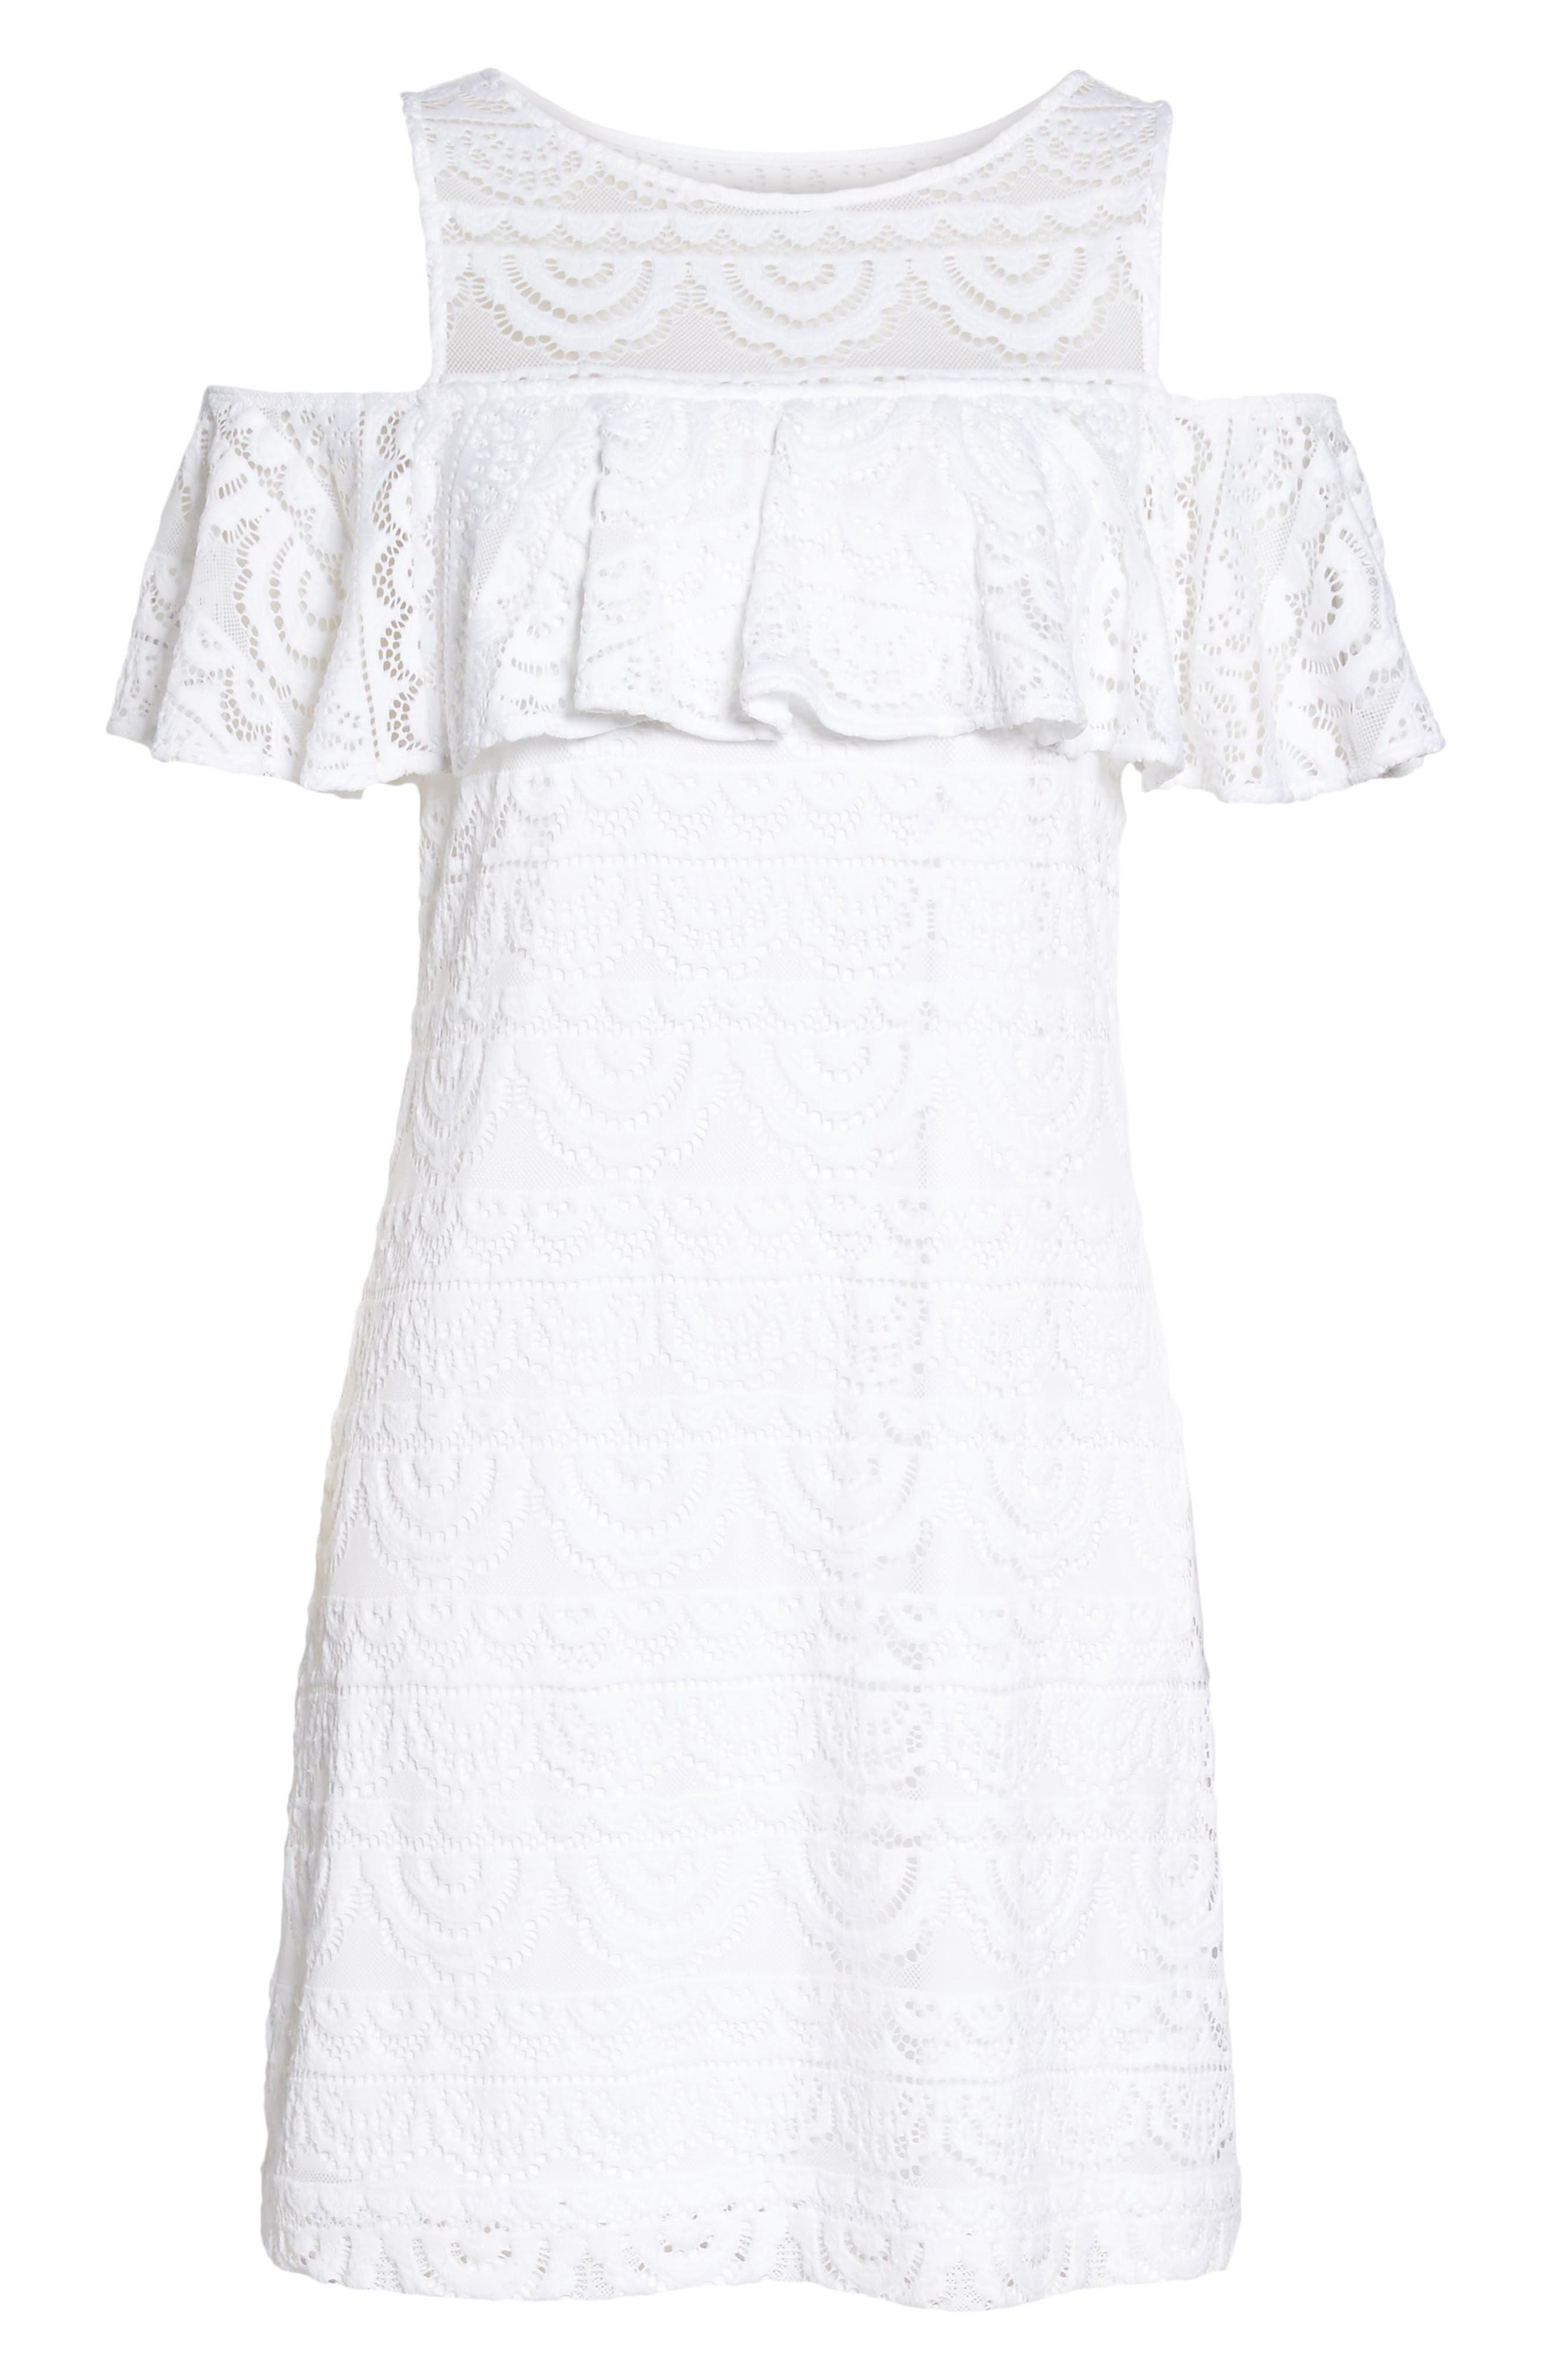 Lyra Cold Shoulder Lace Dress,                             Alternate thumbnail 6, color,                             100